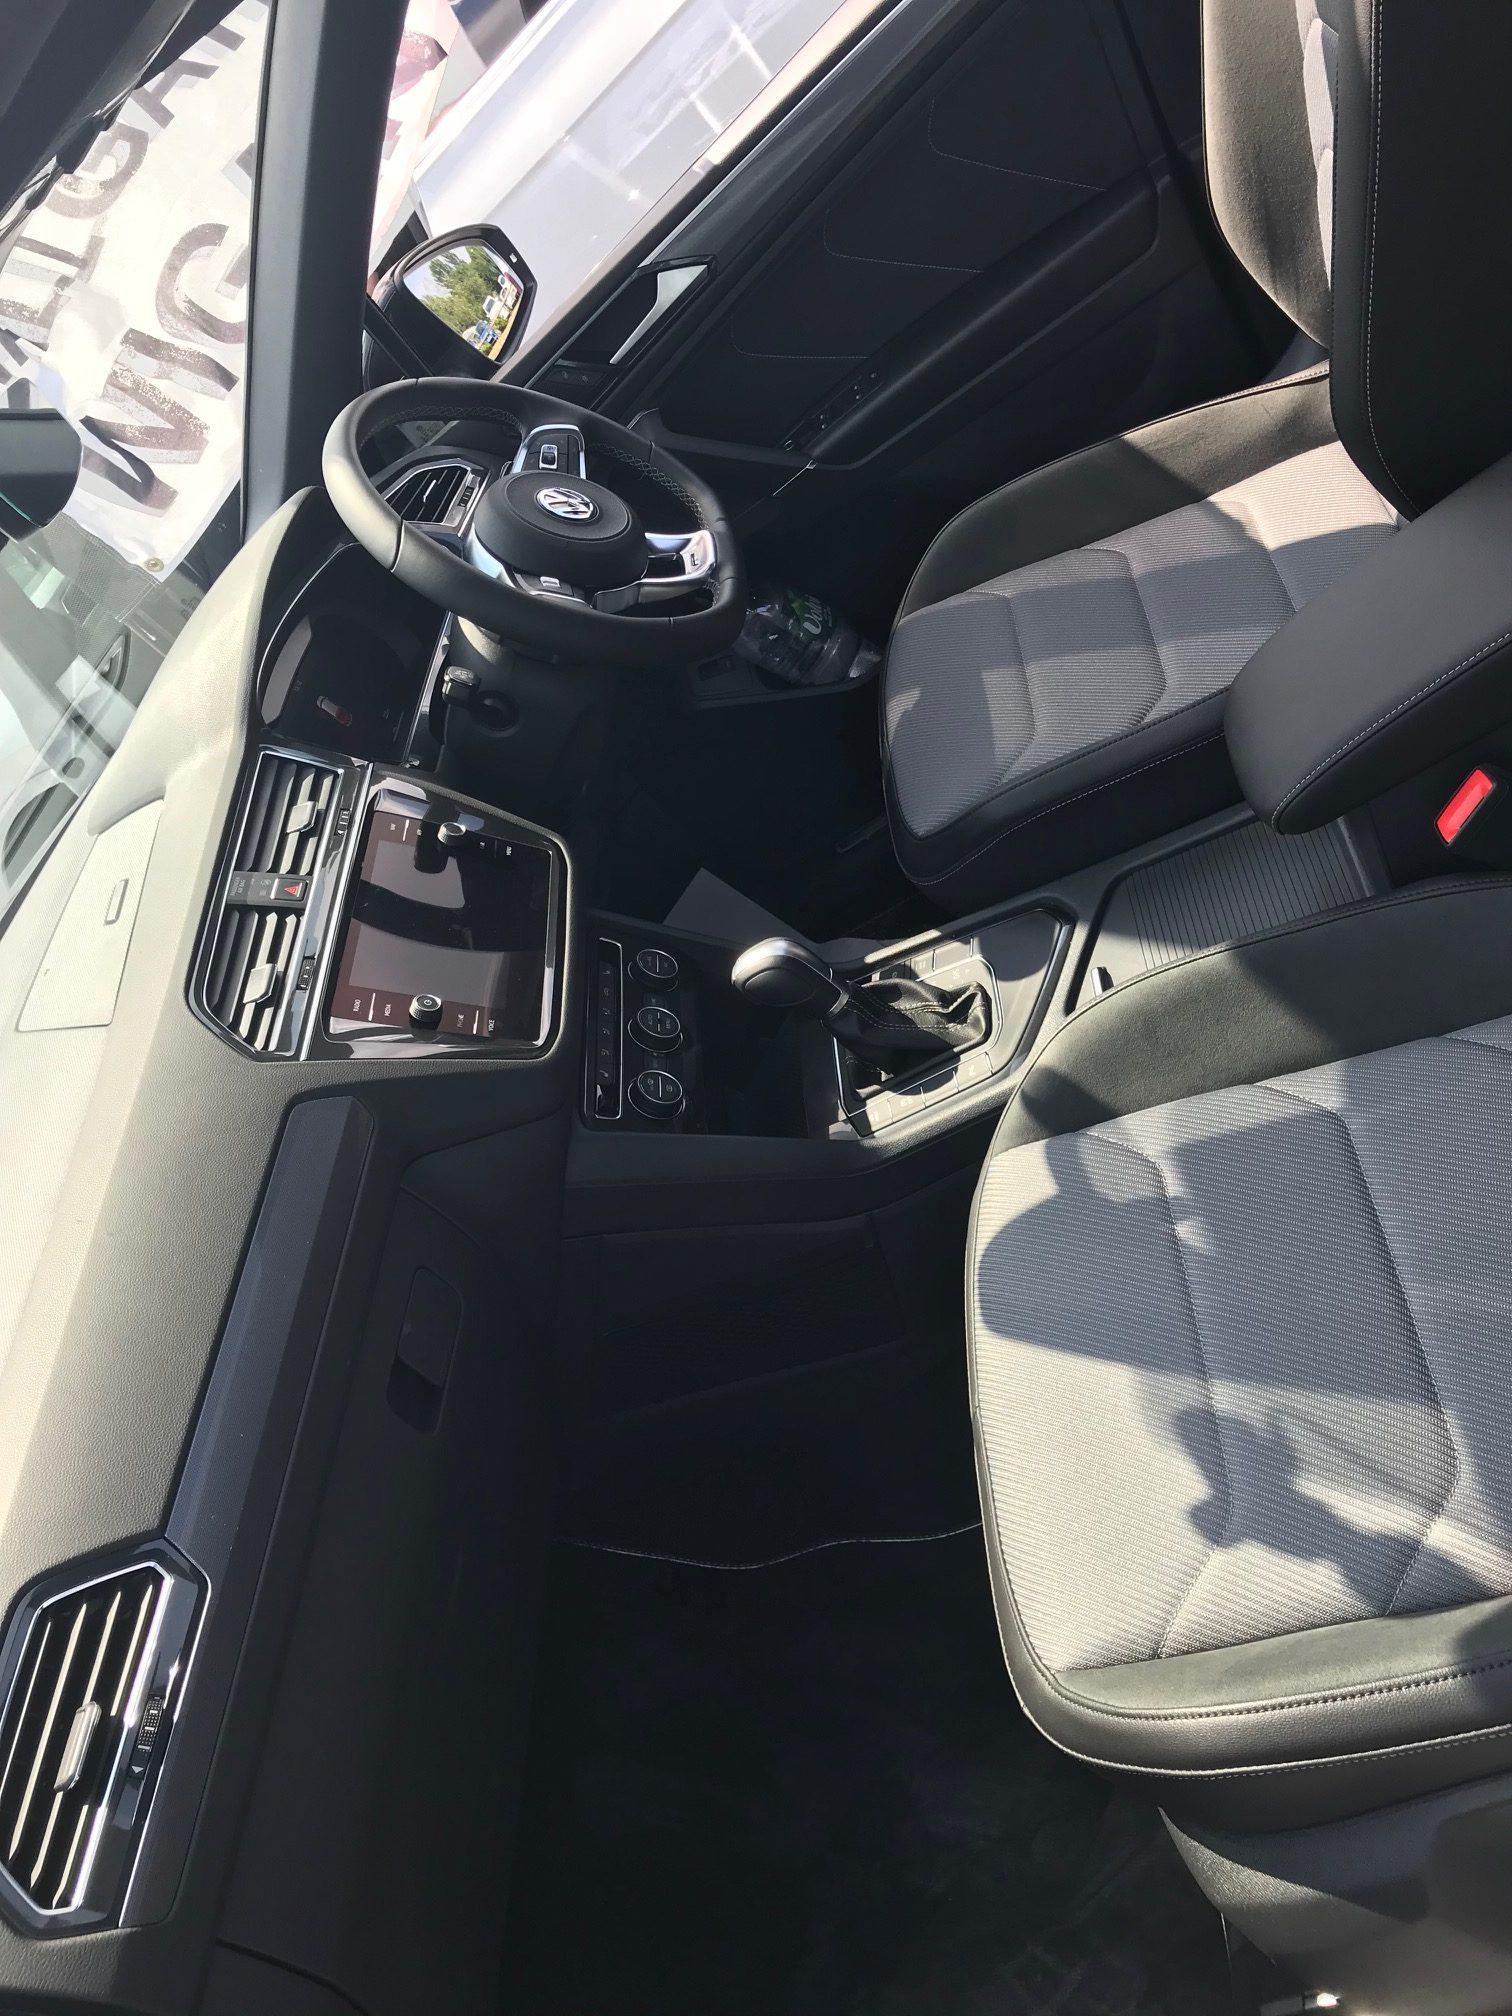 Volkswagen TIGUAN ALLSPACE DIESEL ESTATE 2.0 TDi R Line 5dr DSG Car Leasing (7 seat) Select Options